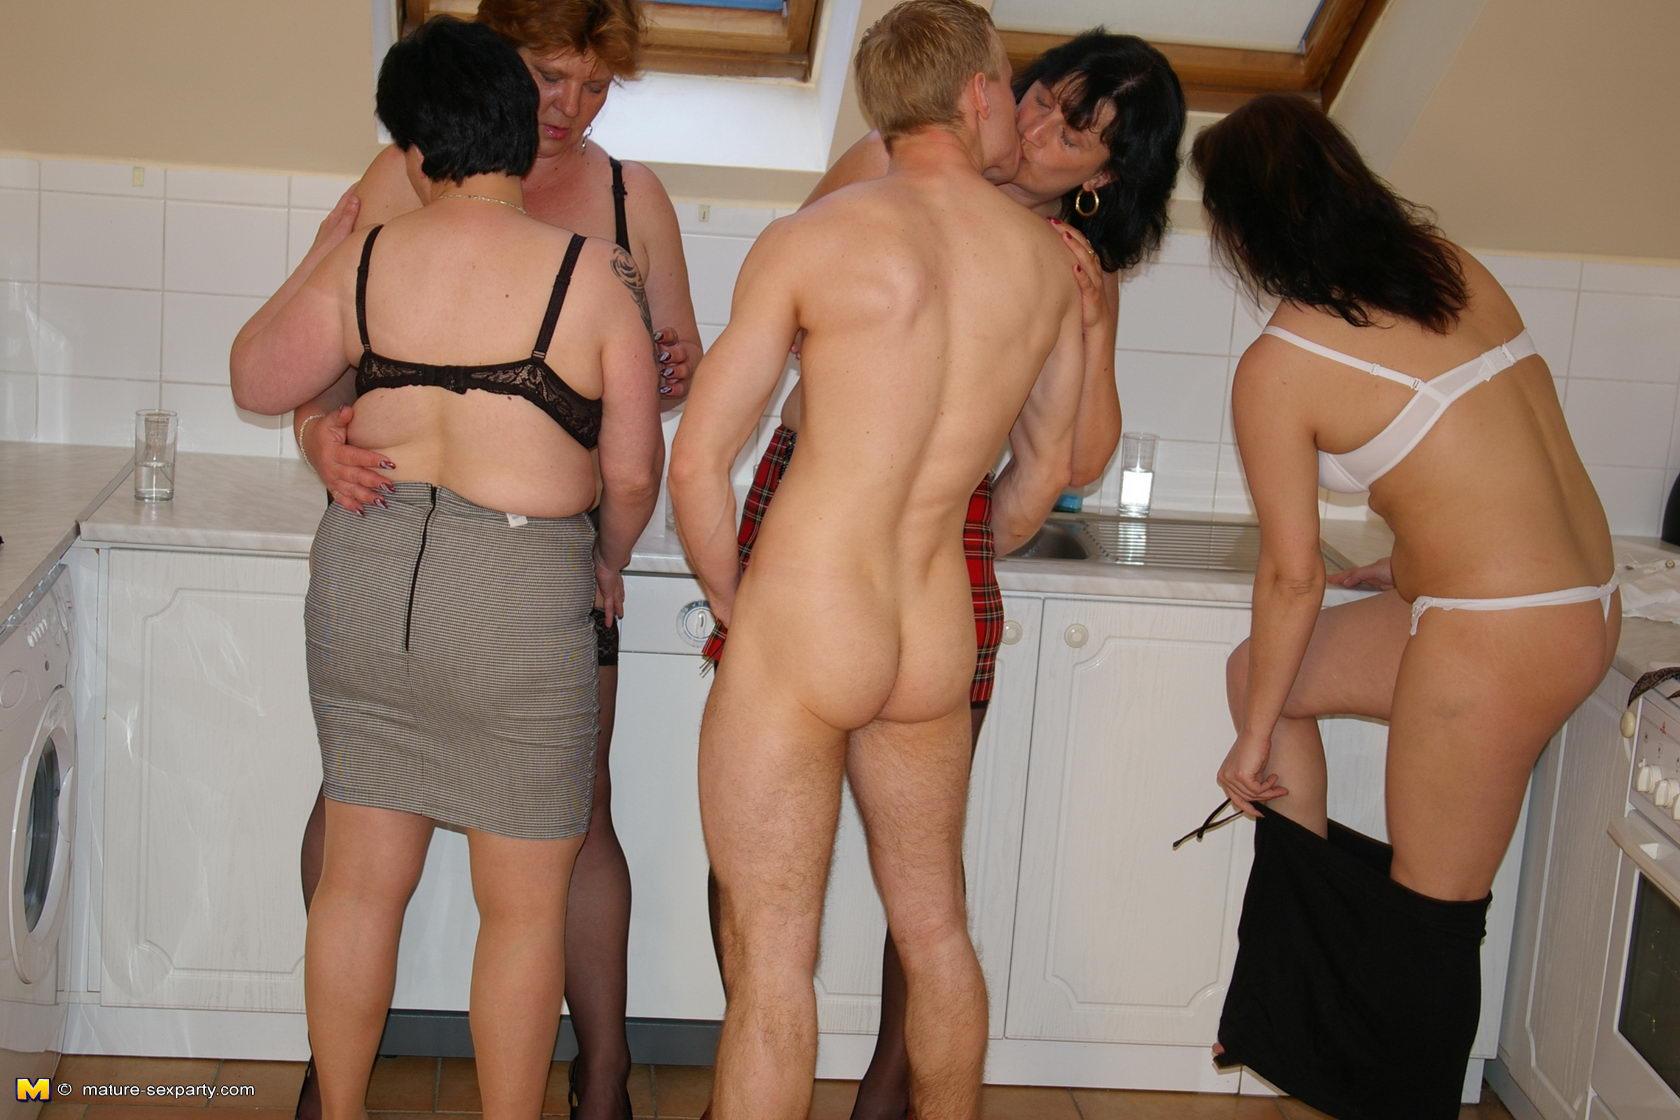 Sex mature party group Group Sex